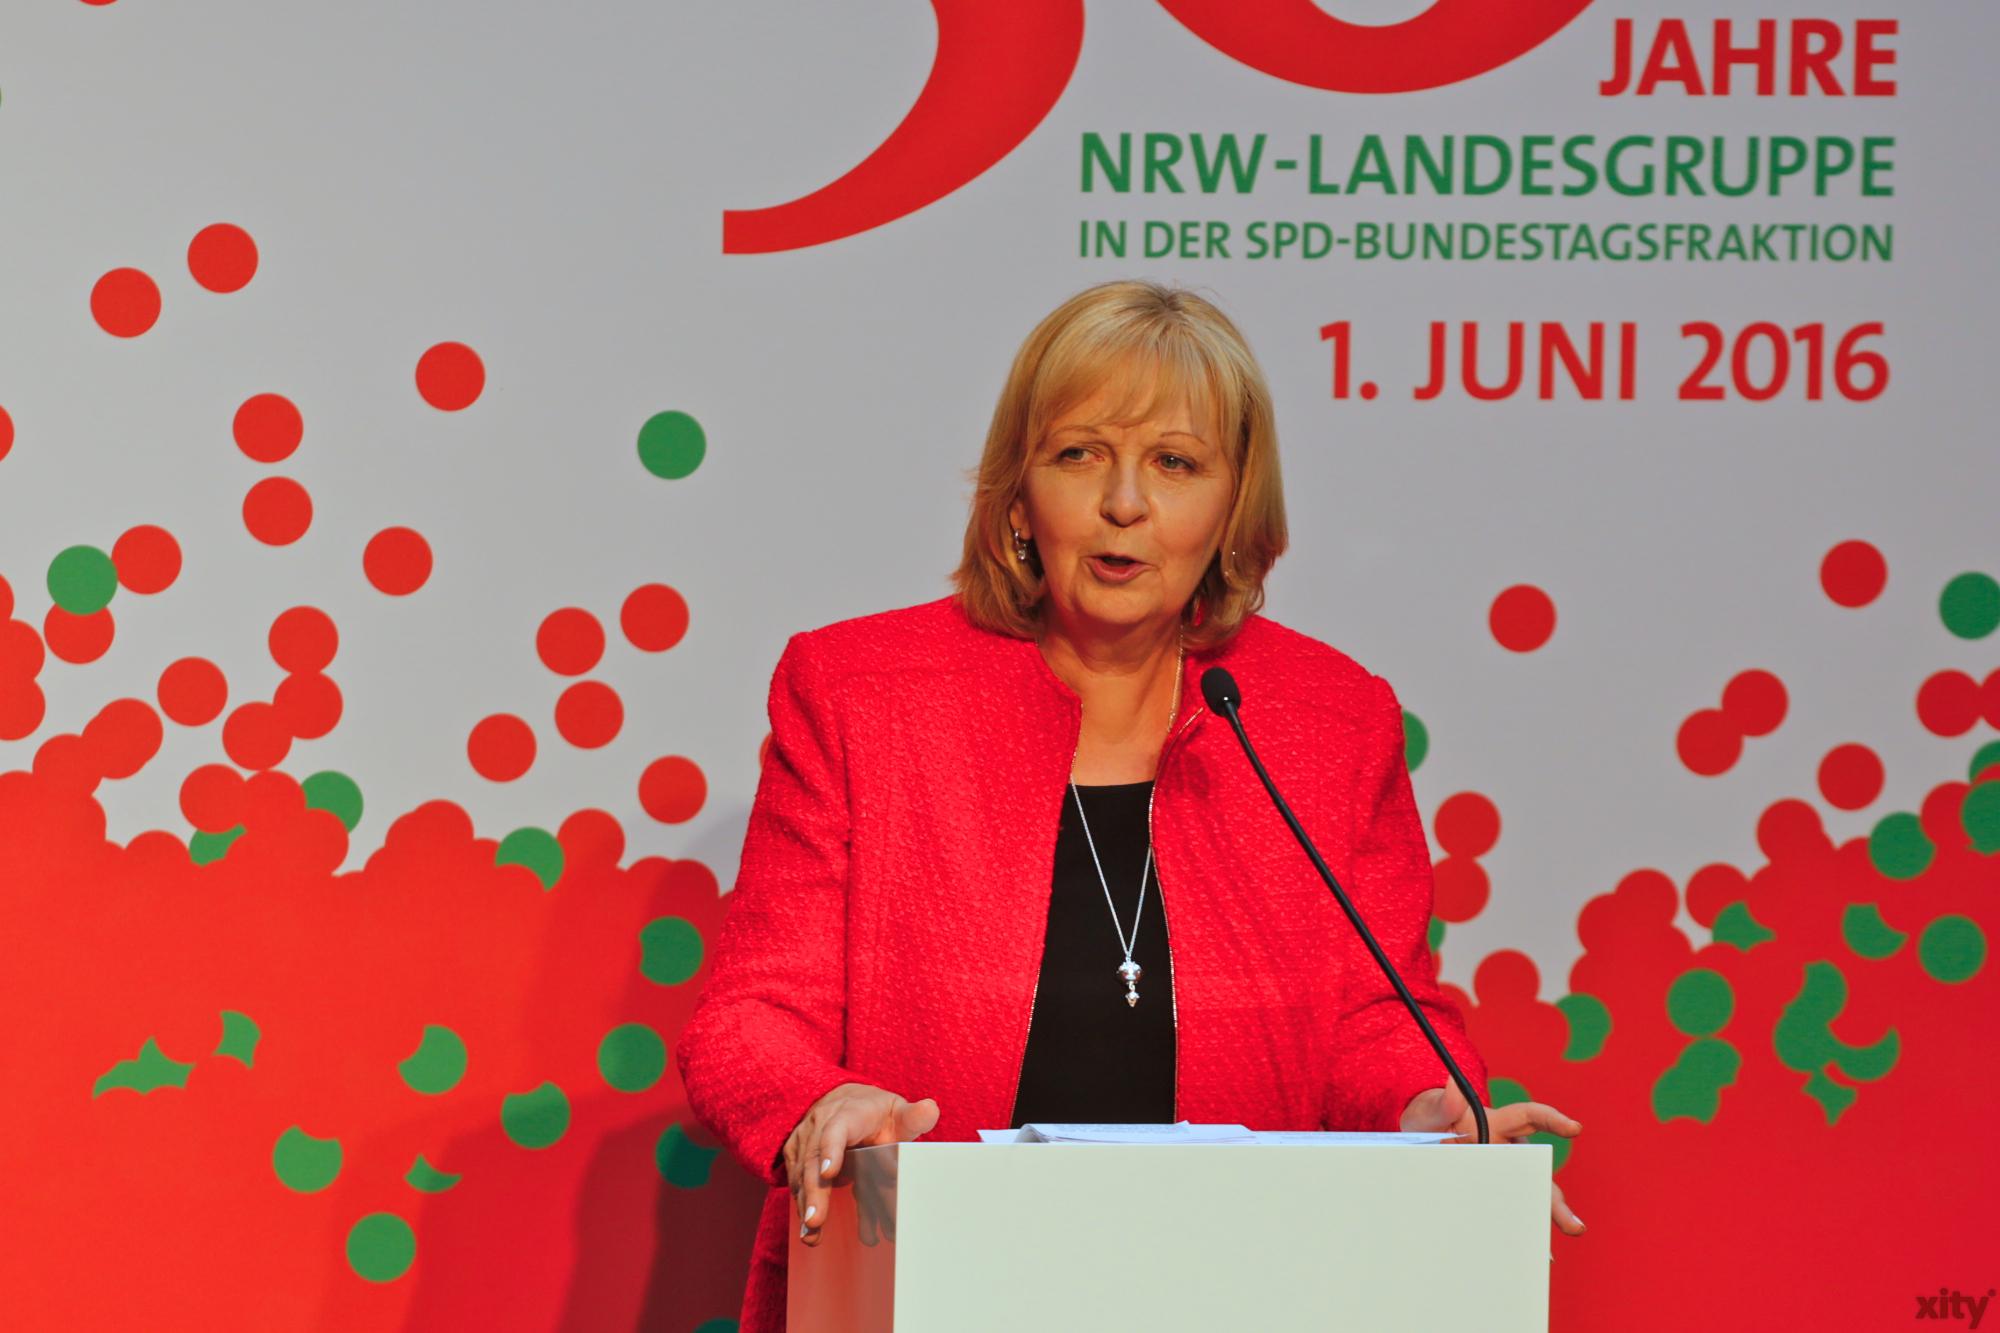 Hannelore Kraft, Ministerpräsidentin NRW (Foto: xity)